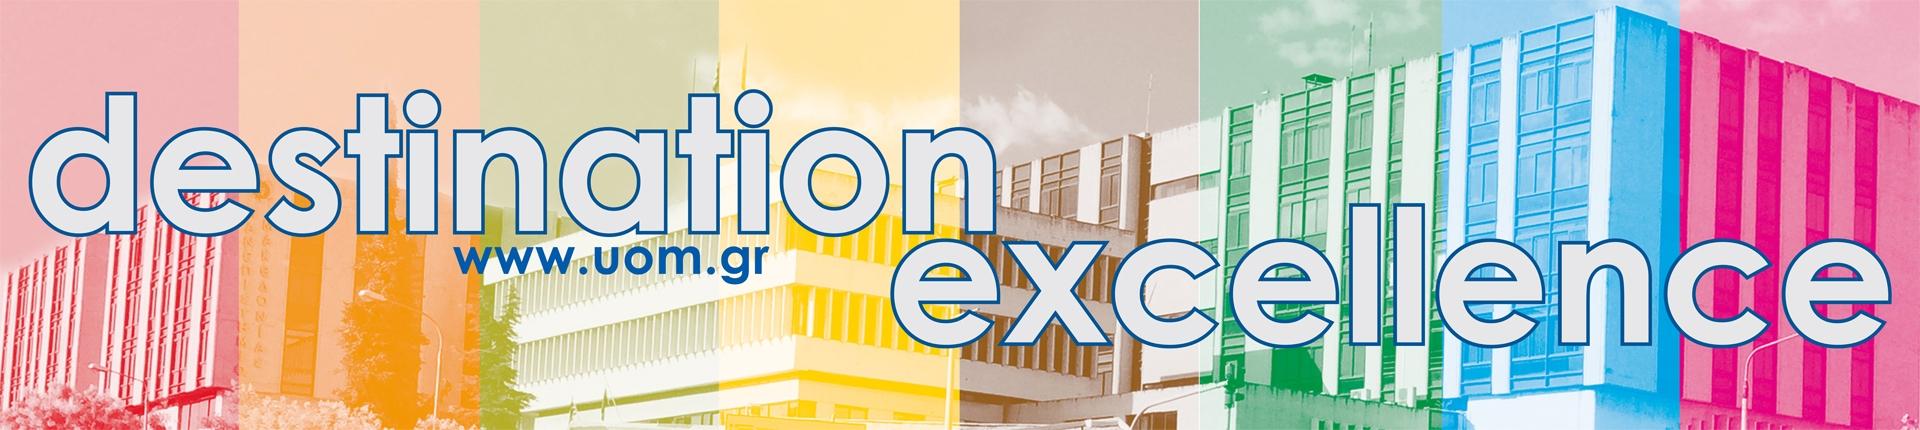 uom_destination_excellencesite-1